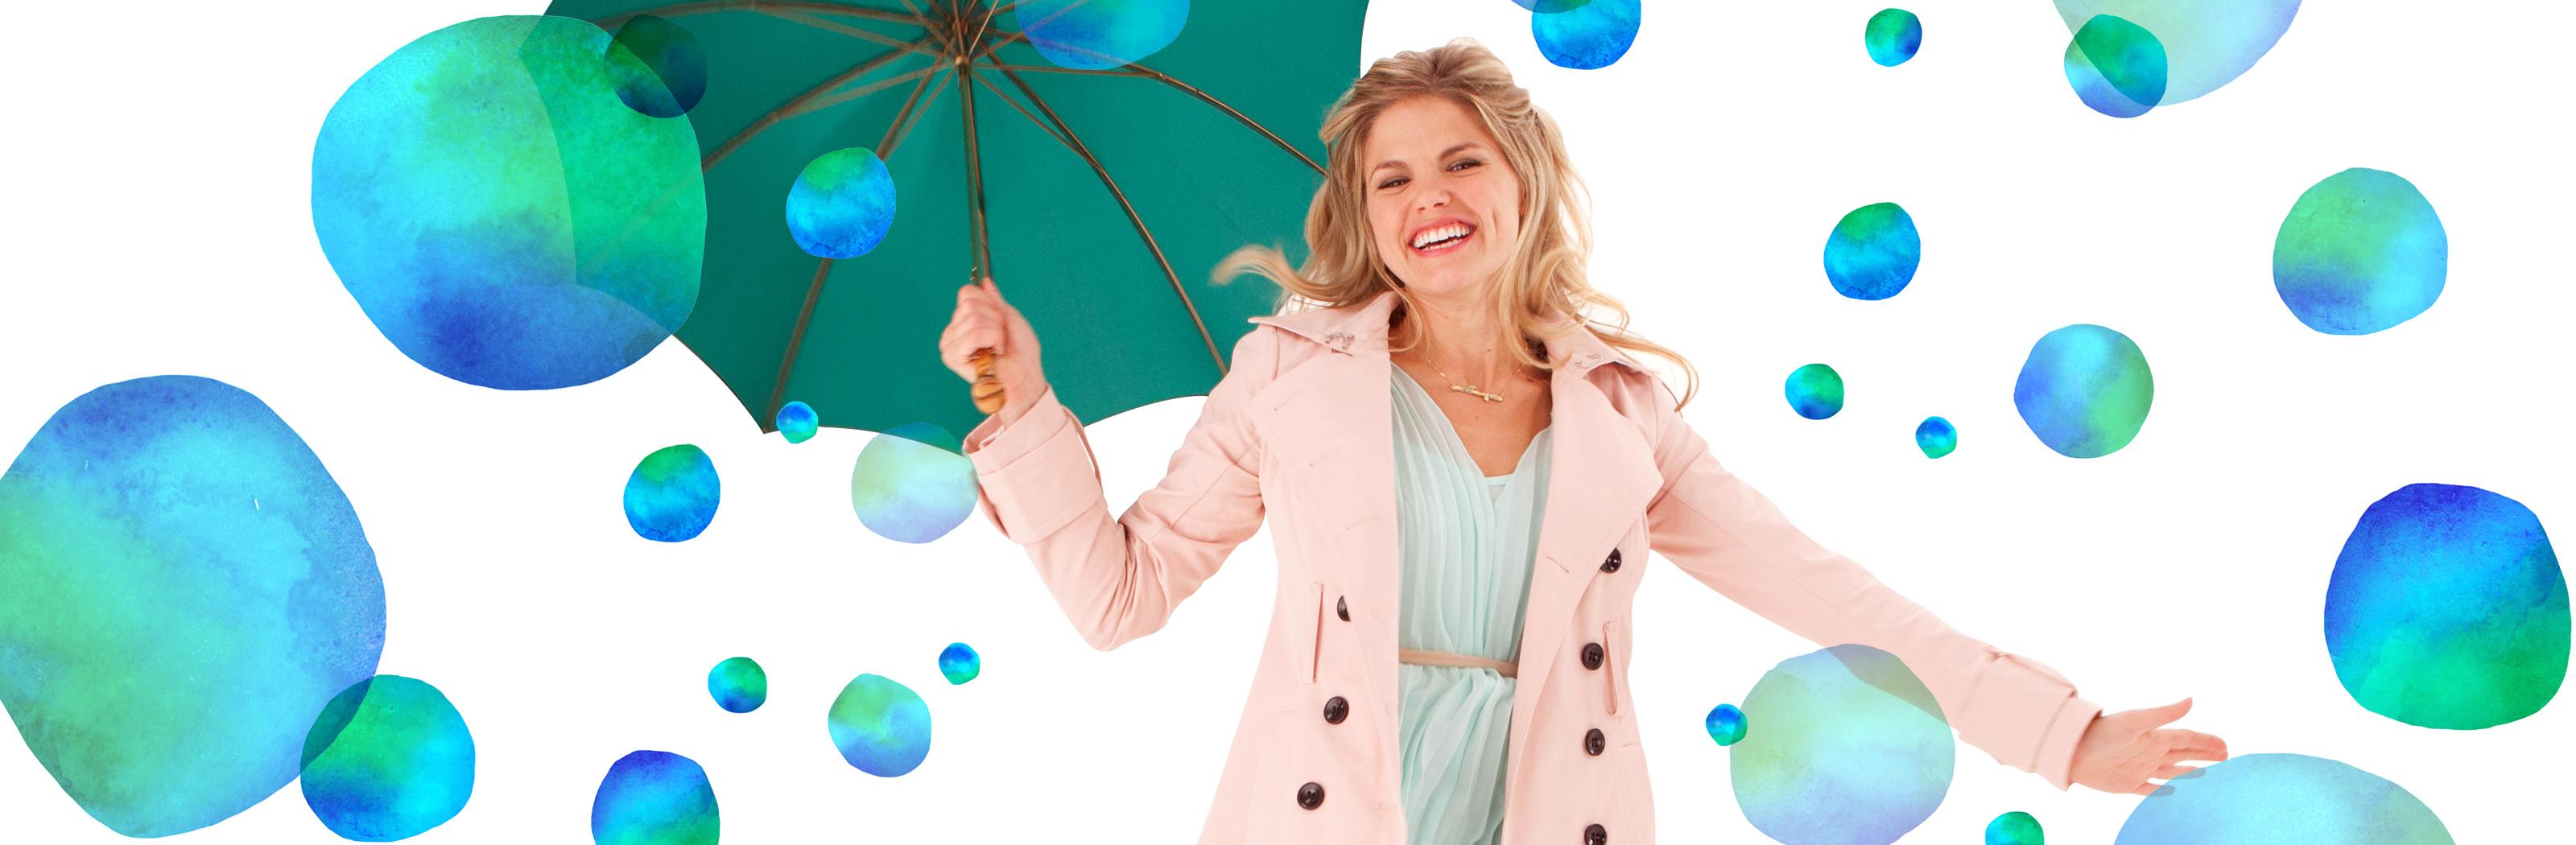 Laiminga moteris su skėčiu